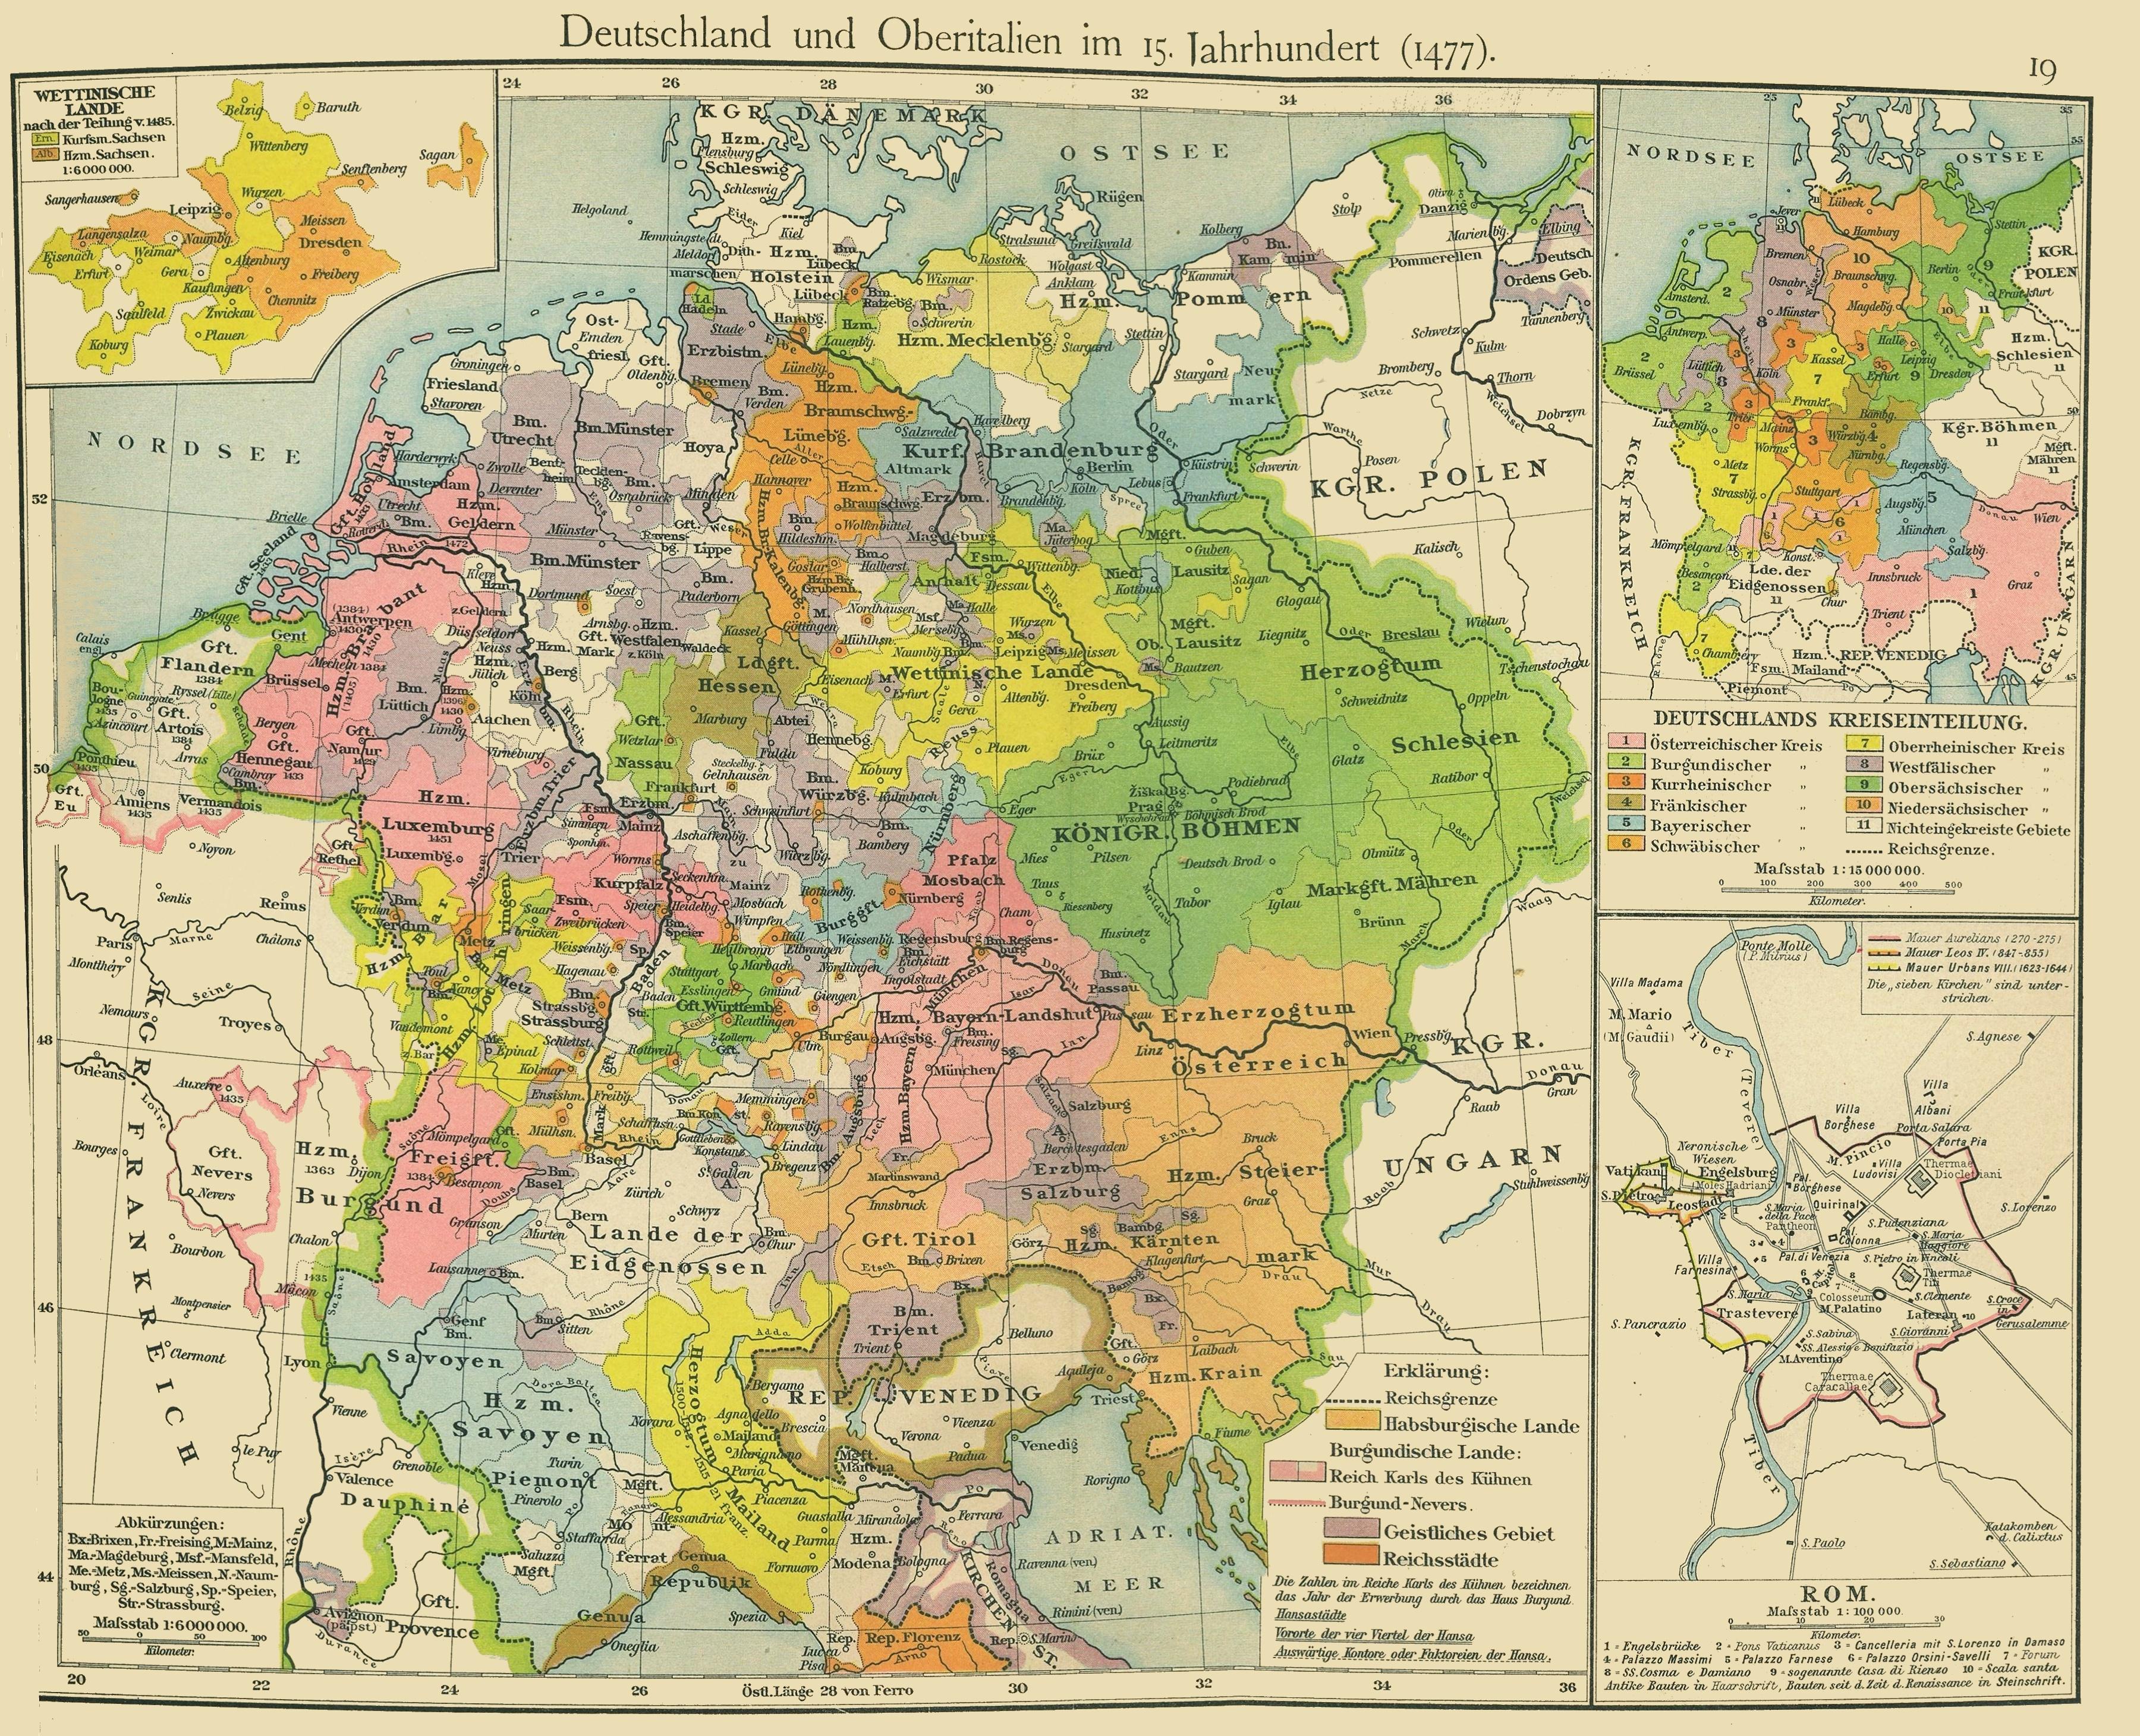 Файл:Deutschl&Oberitalien.1477.jpg